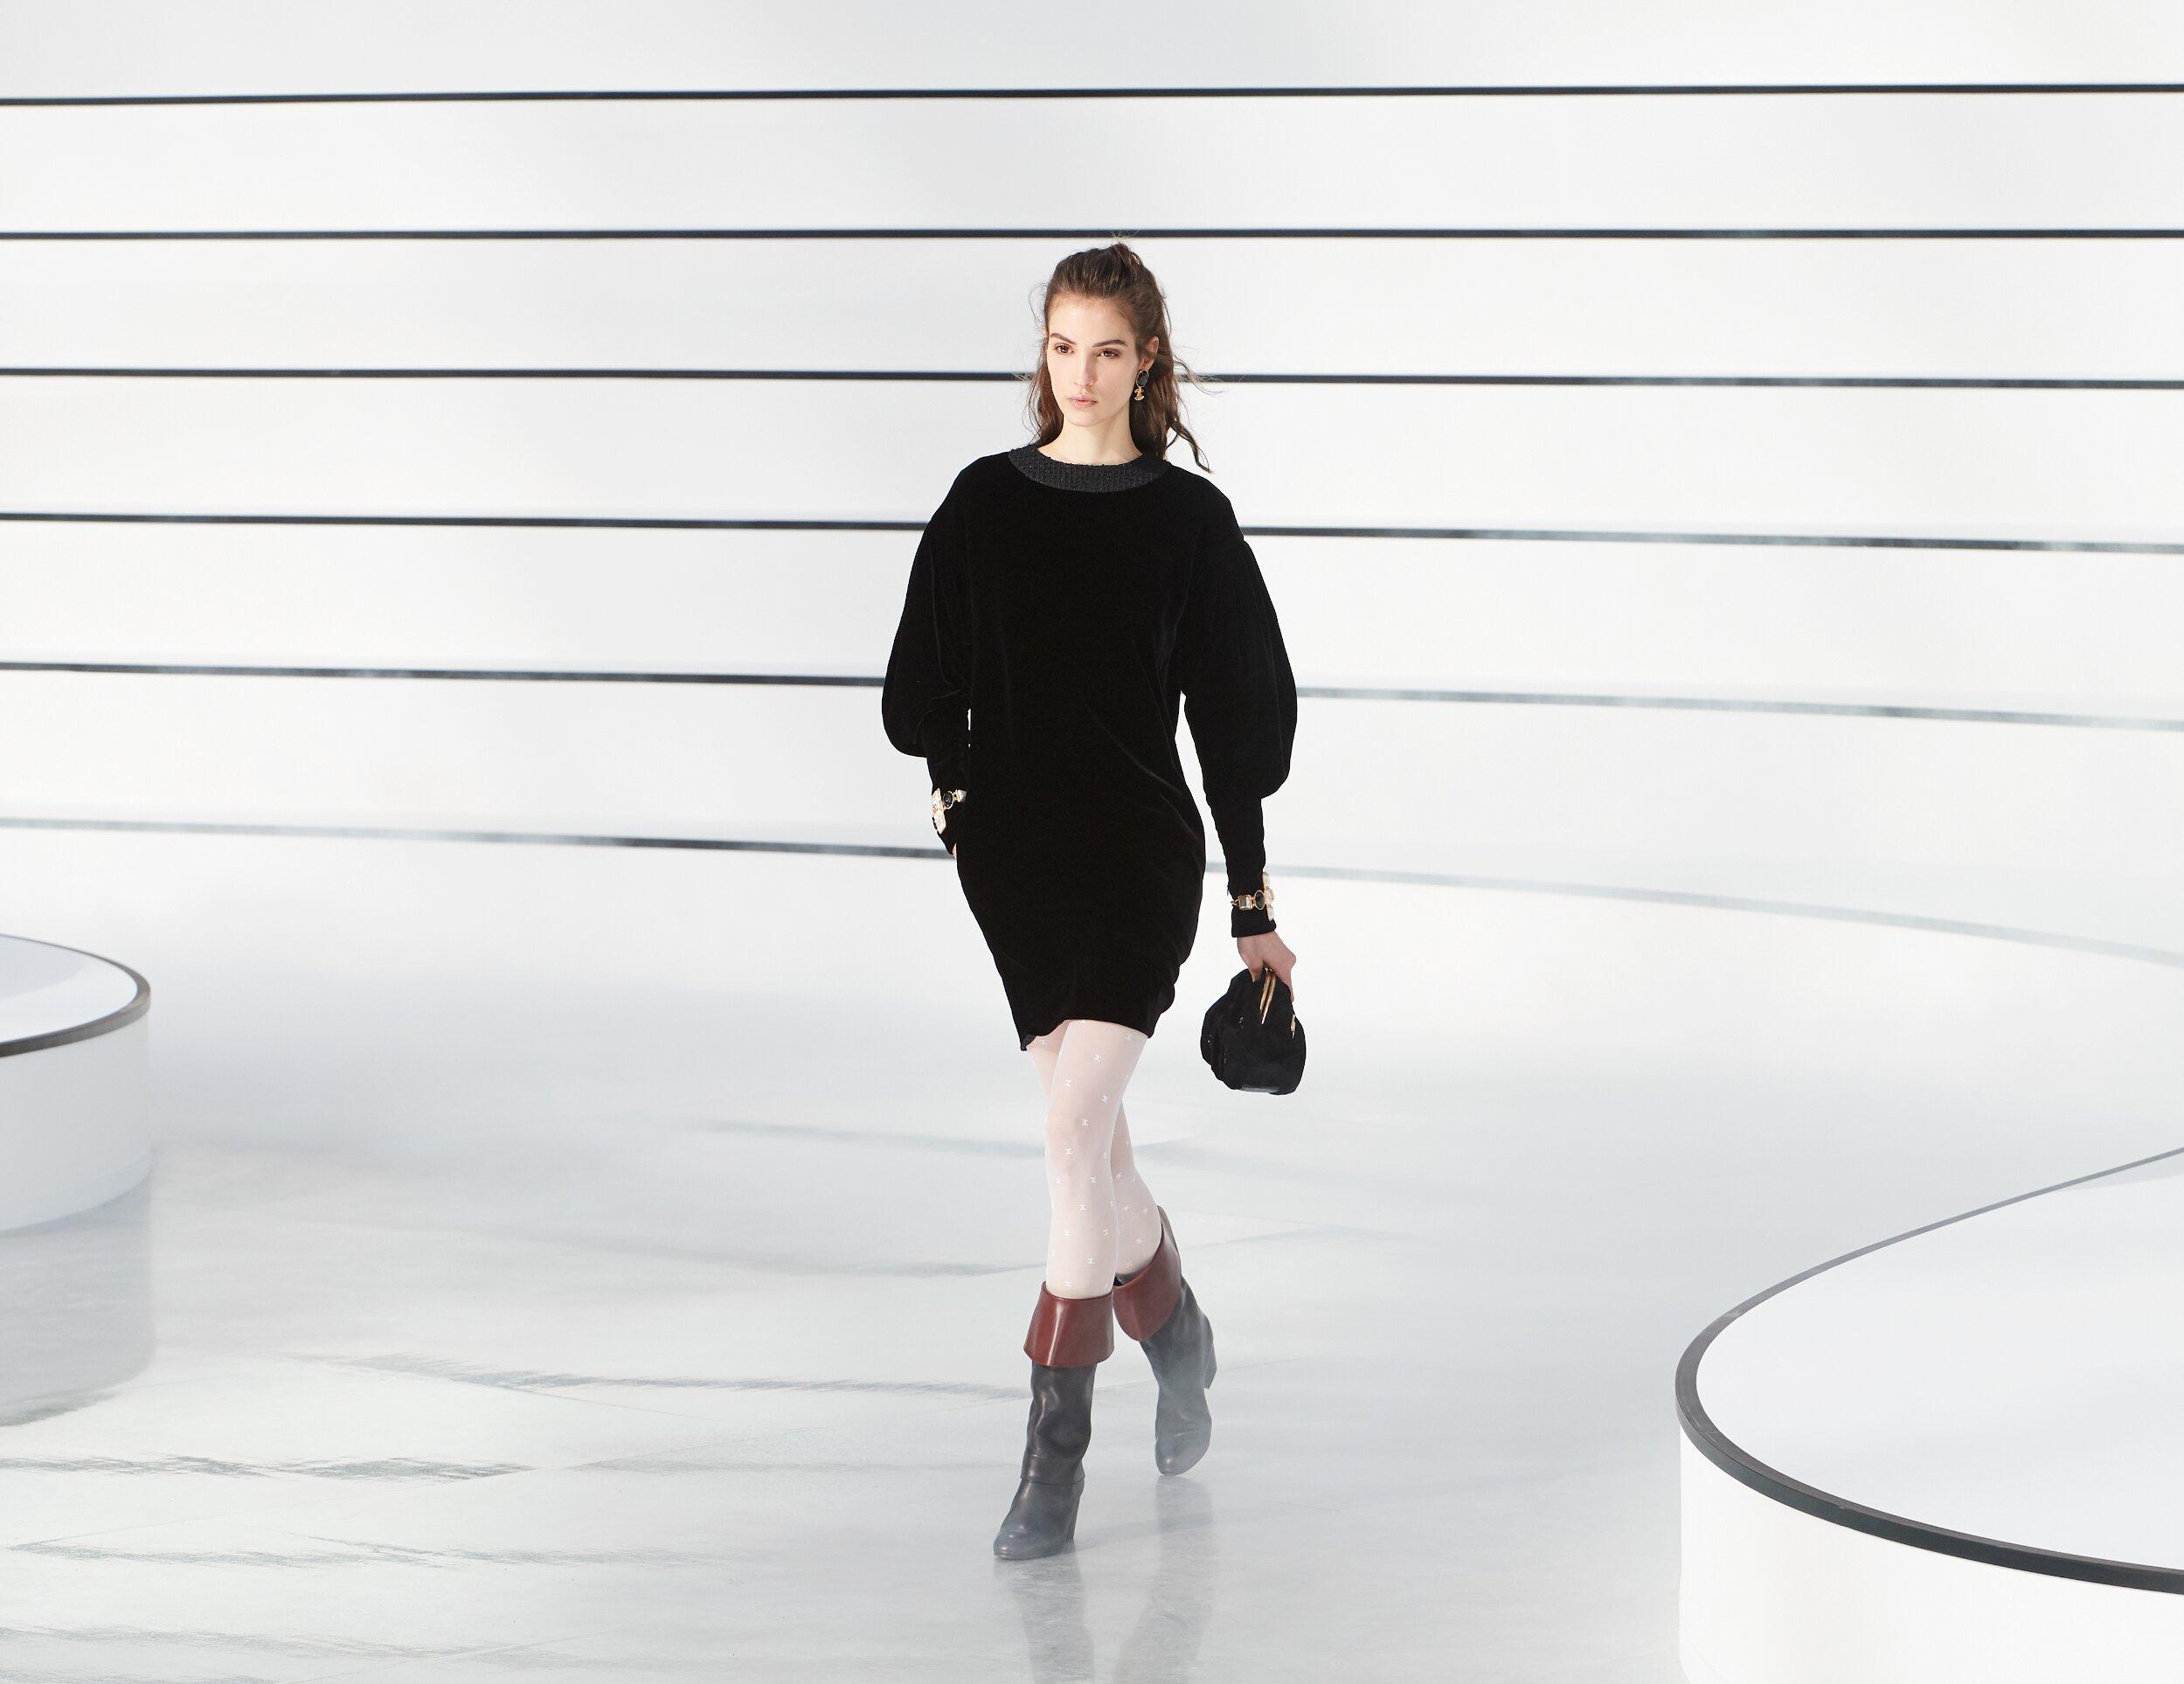 Fall Winter Fashion Trends 2020 Chanel